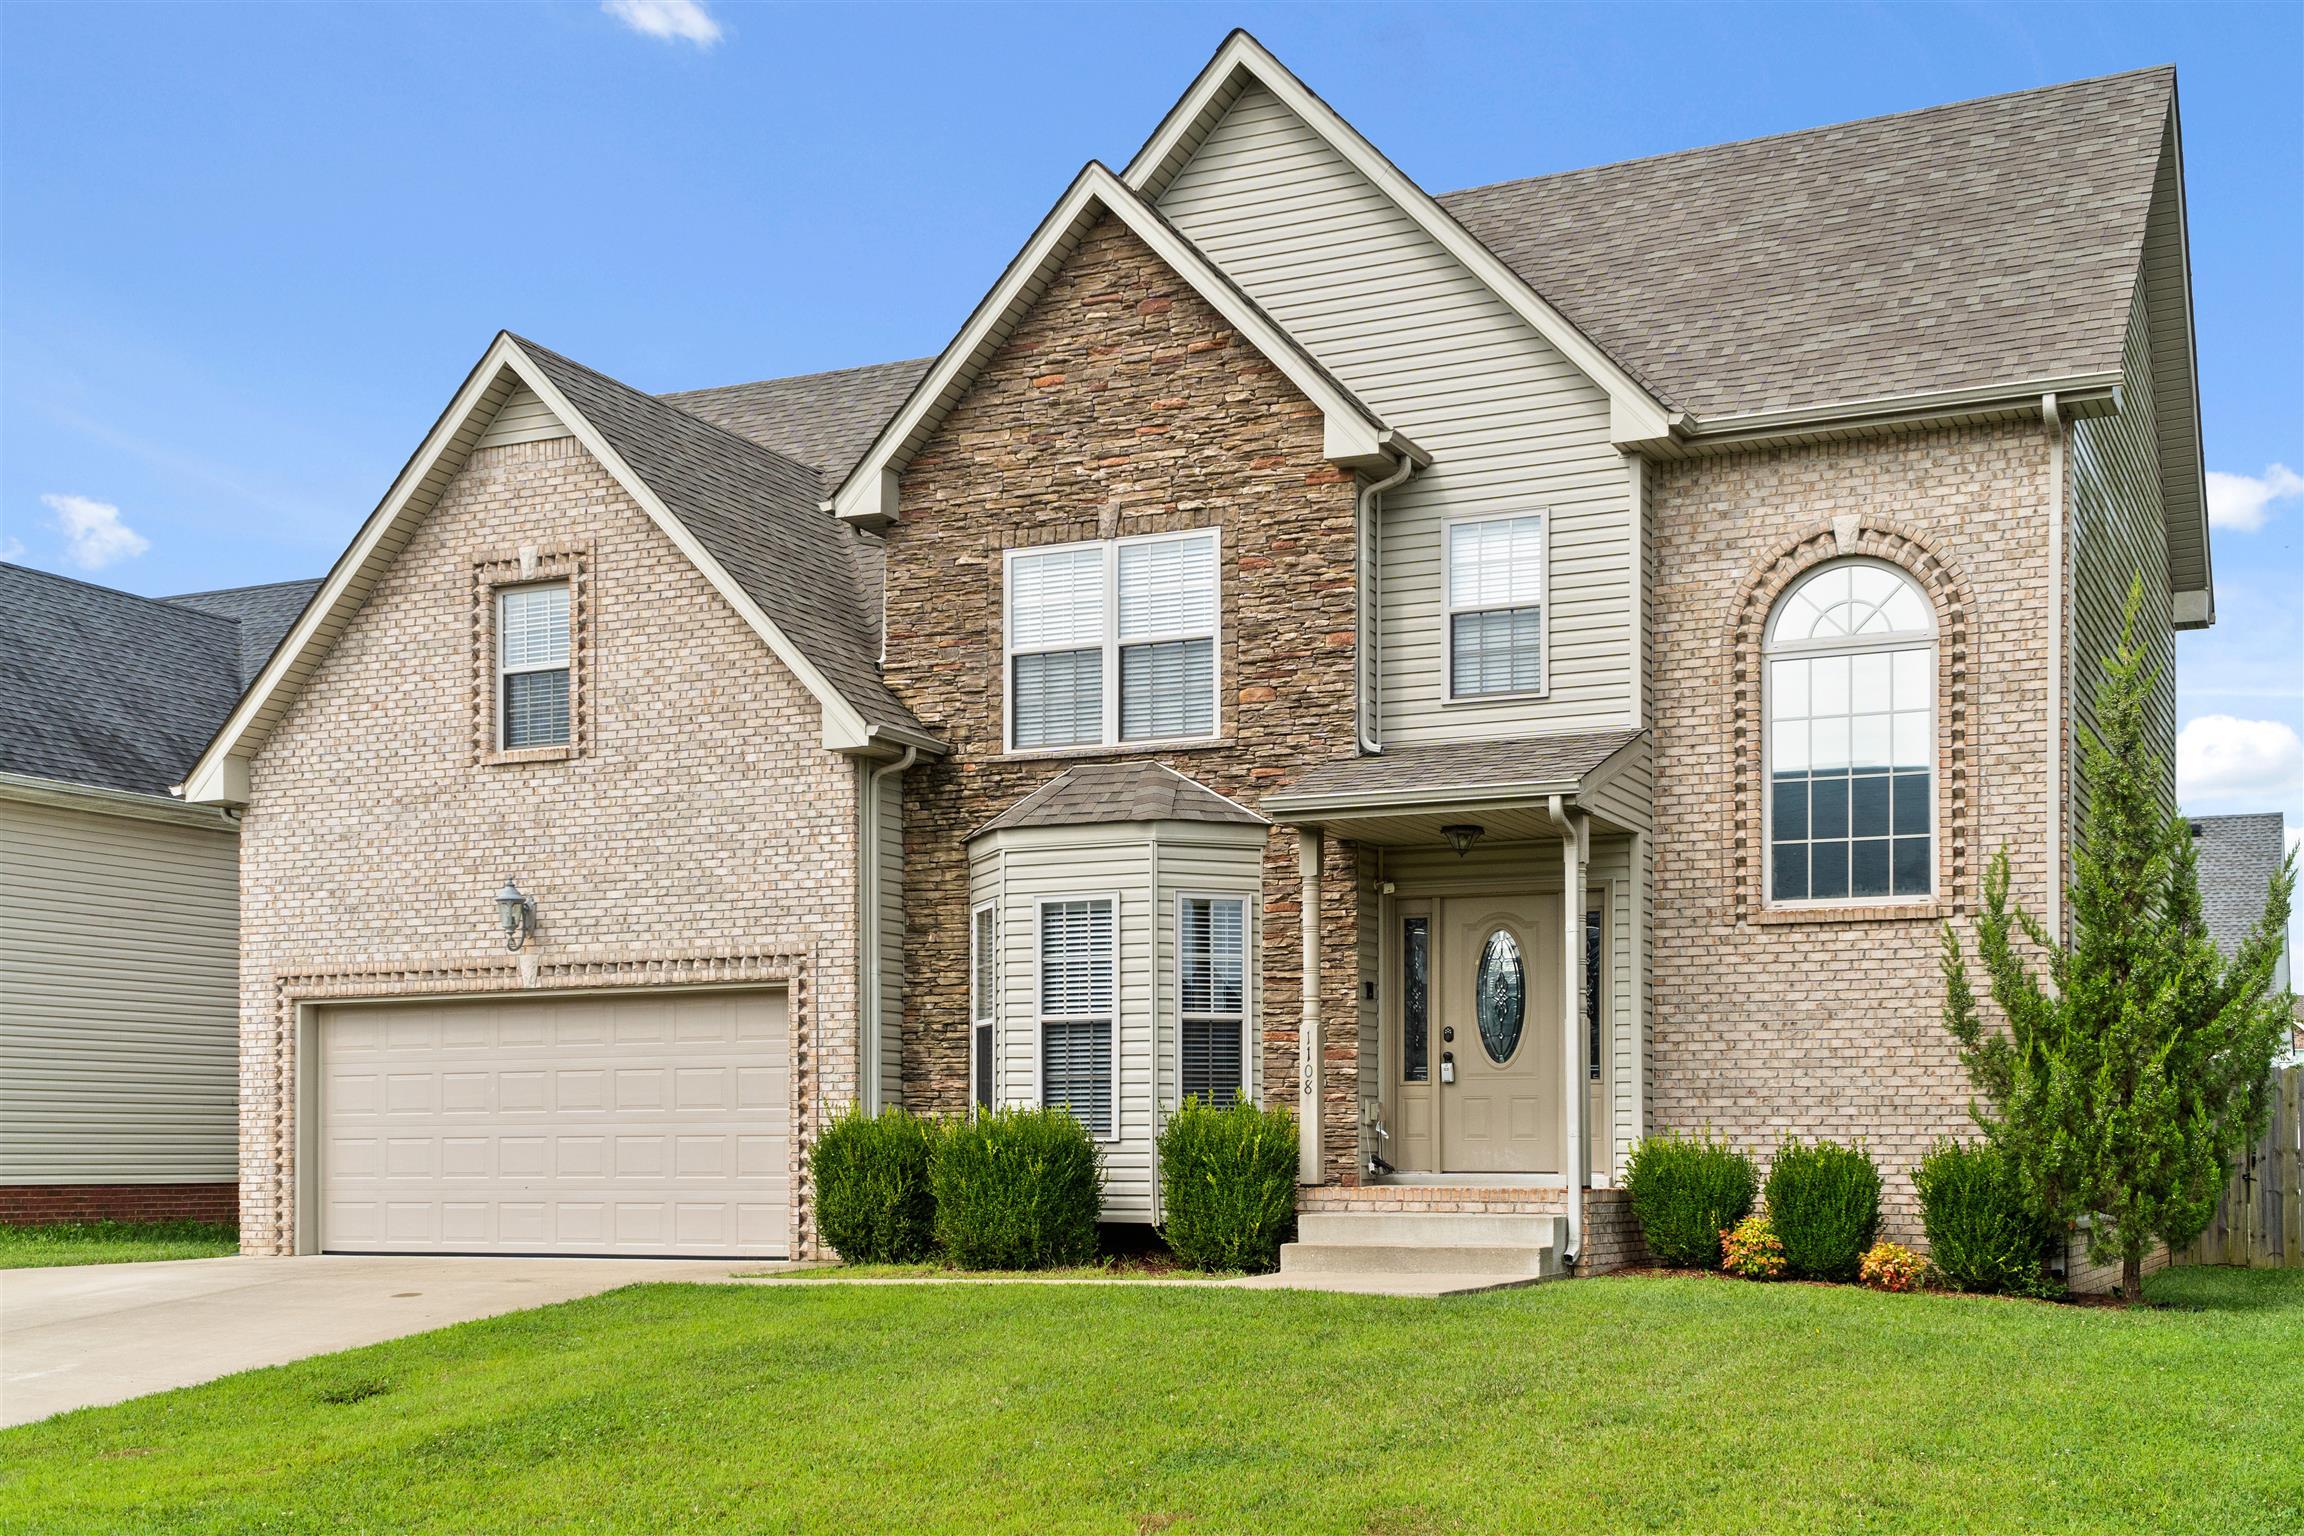 1108 Chinook Cir, Clarksville, TN 37042 - Clarksville, TN real estate listing